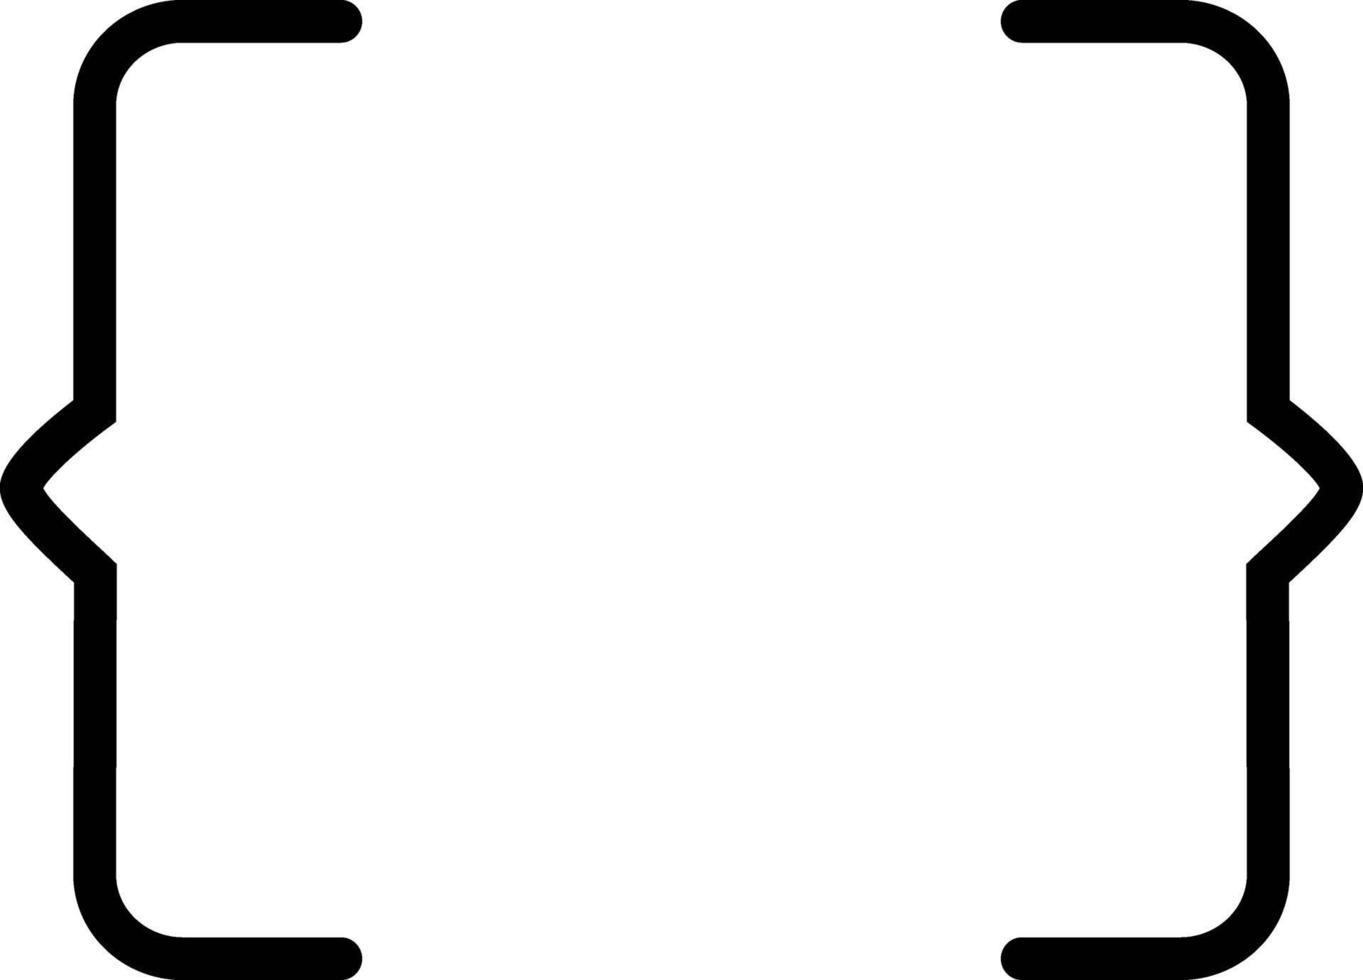 icono de línea para corchetes vector